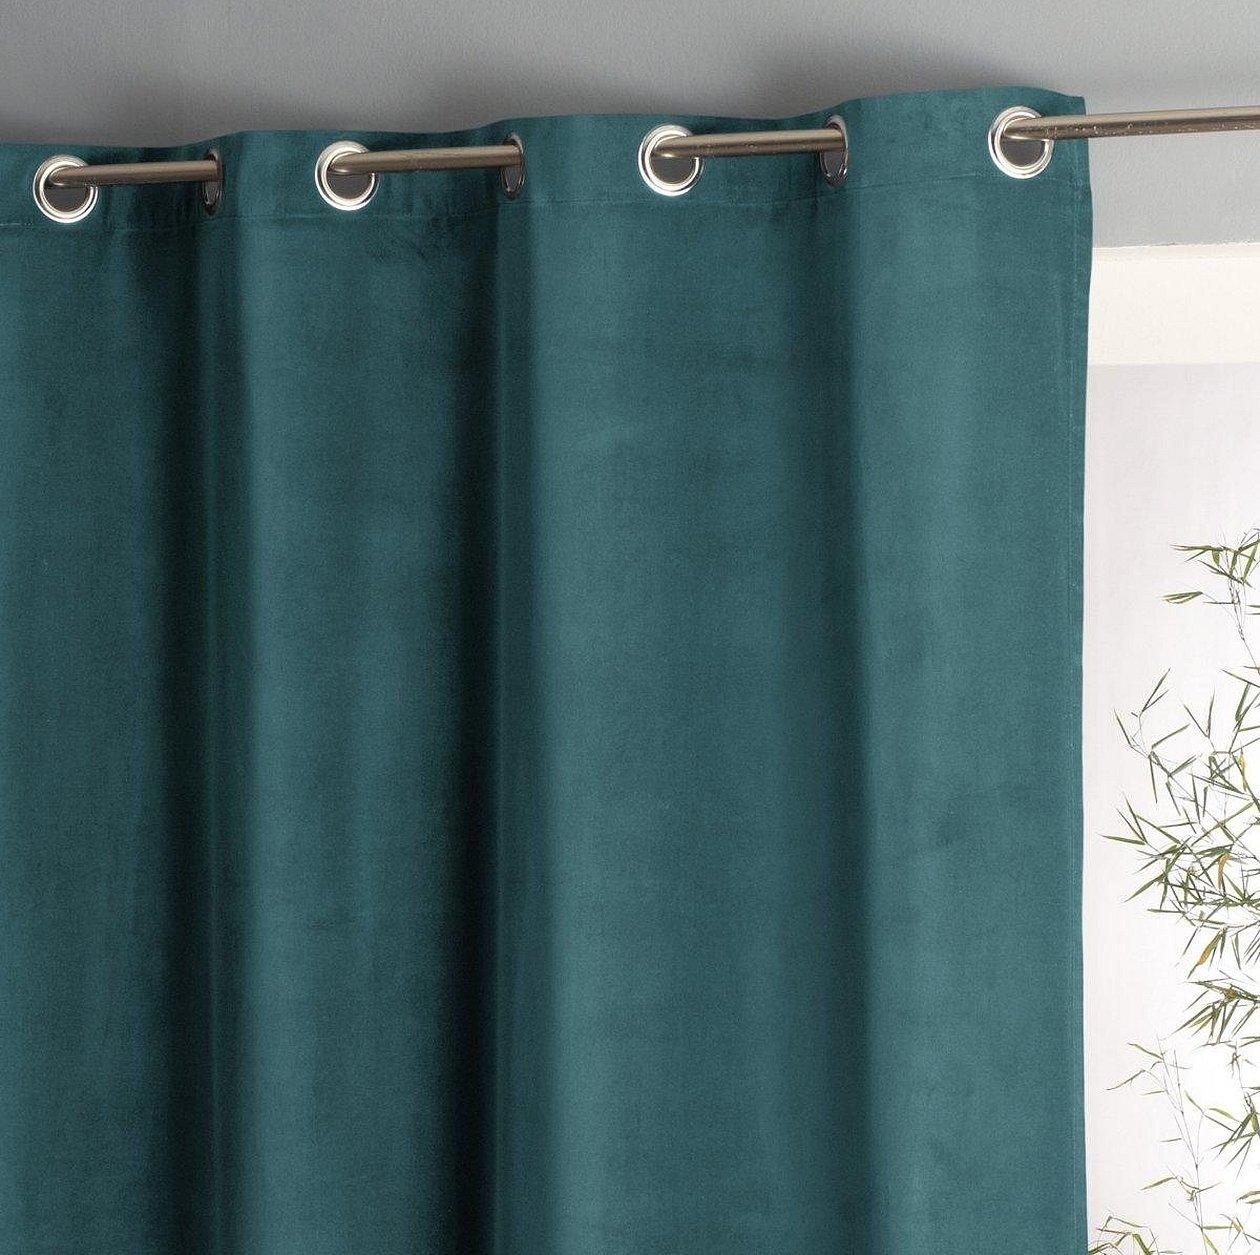 Зеленые бархатные шторы люверсы